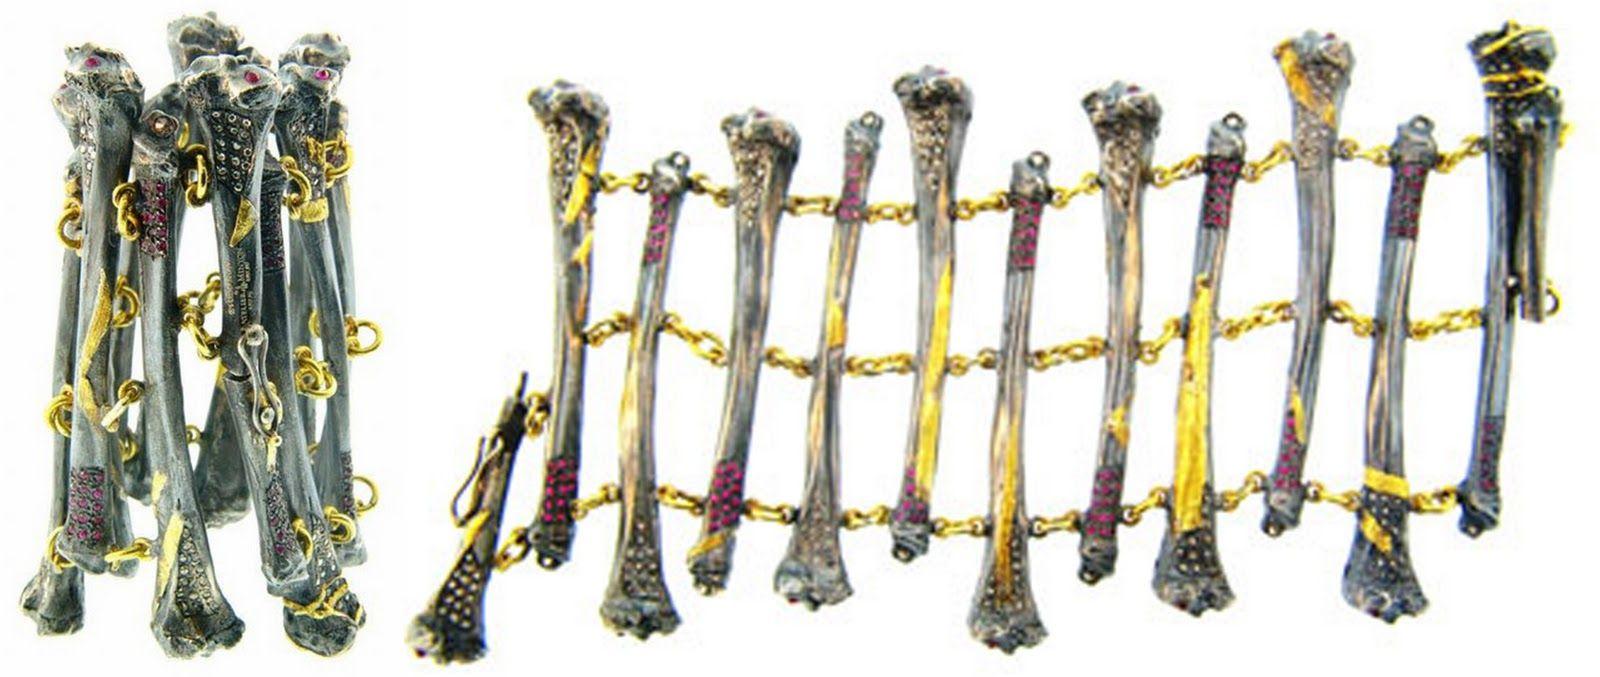 Alp Sagnak created a bone bracelet bedazzled with rubies and diamonds.